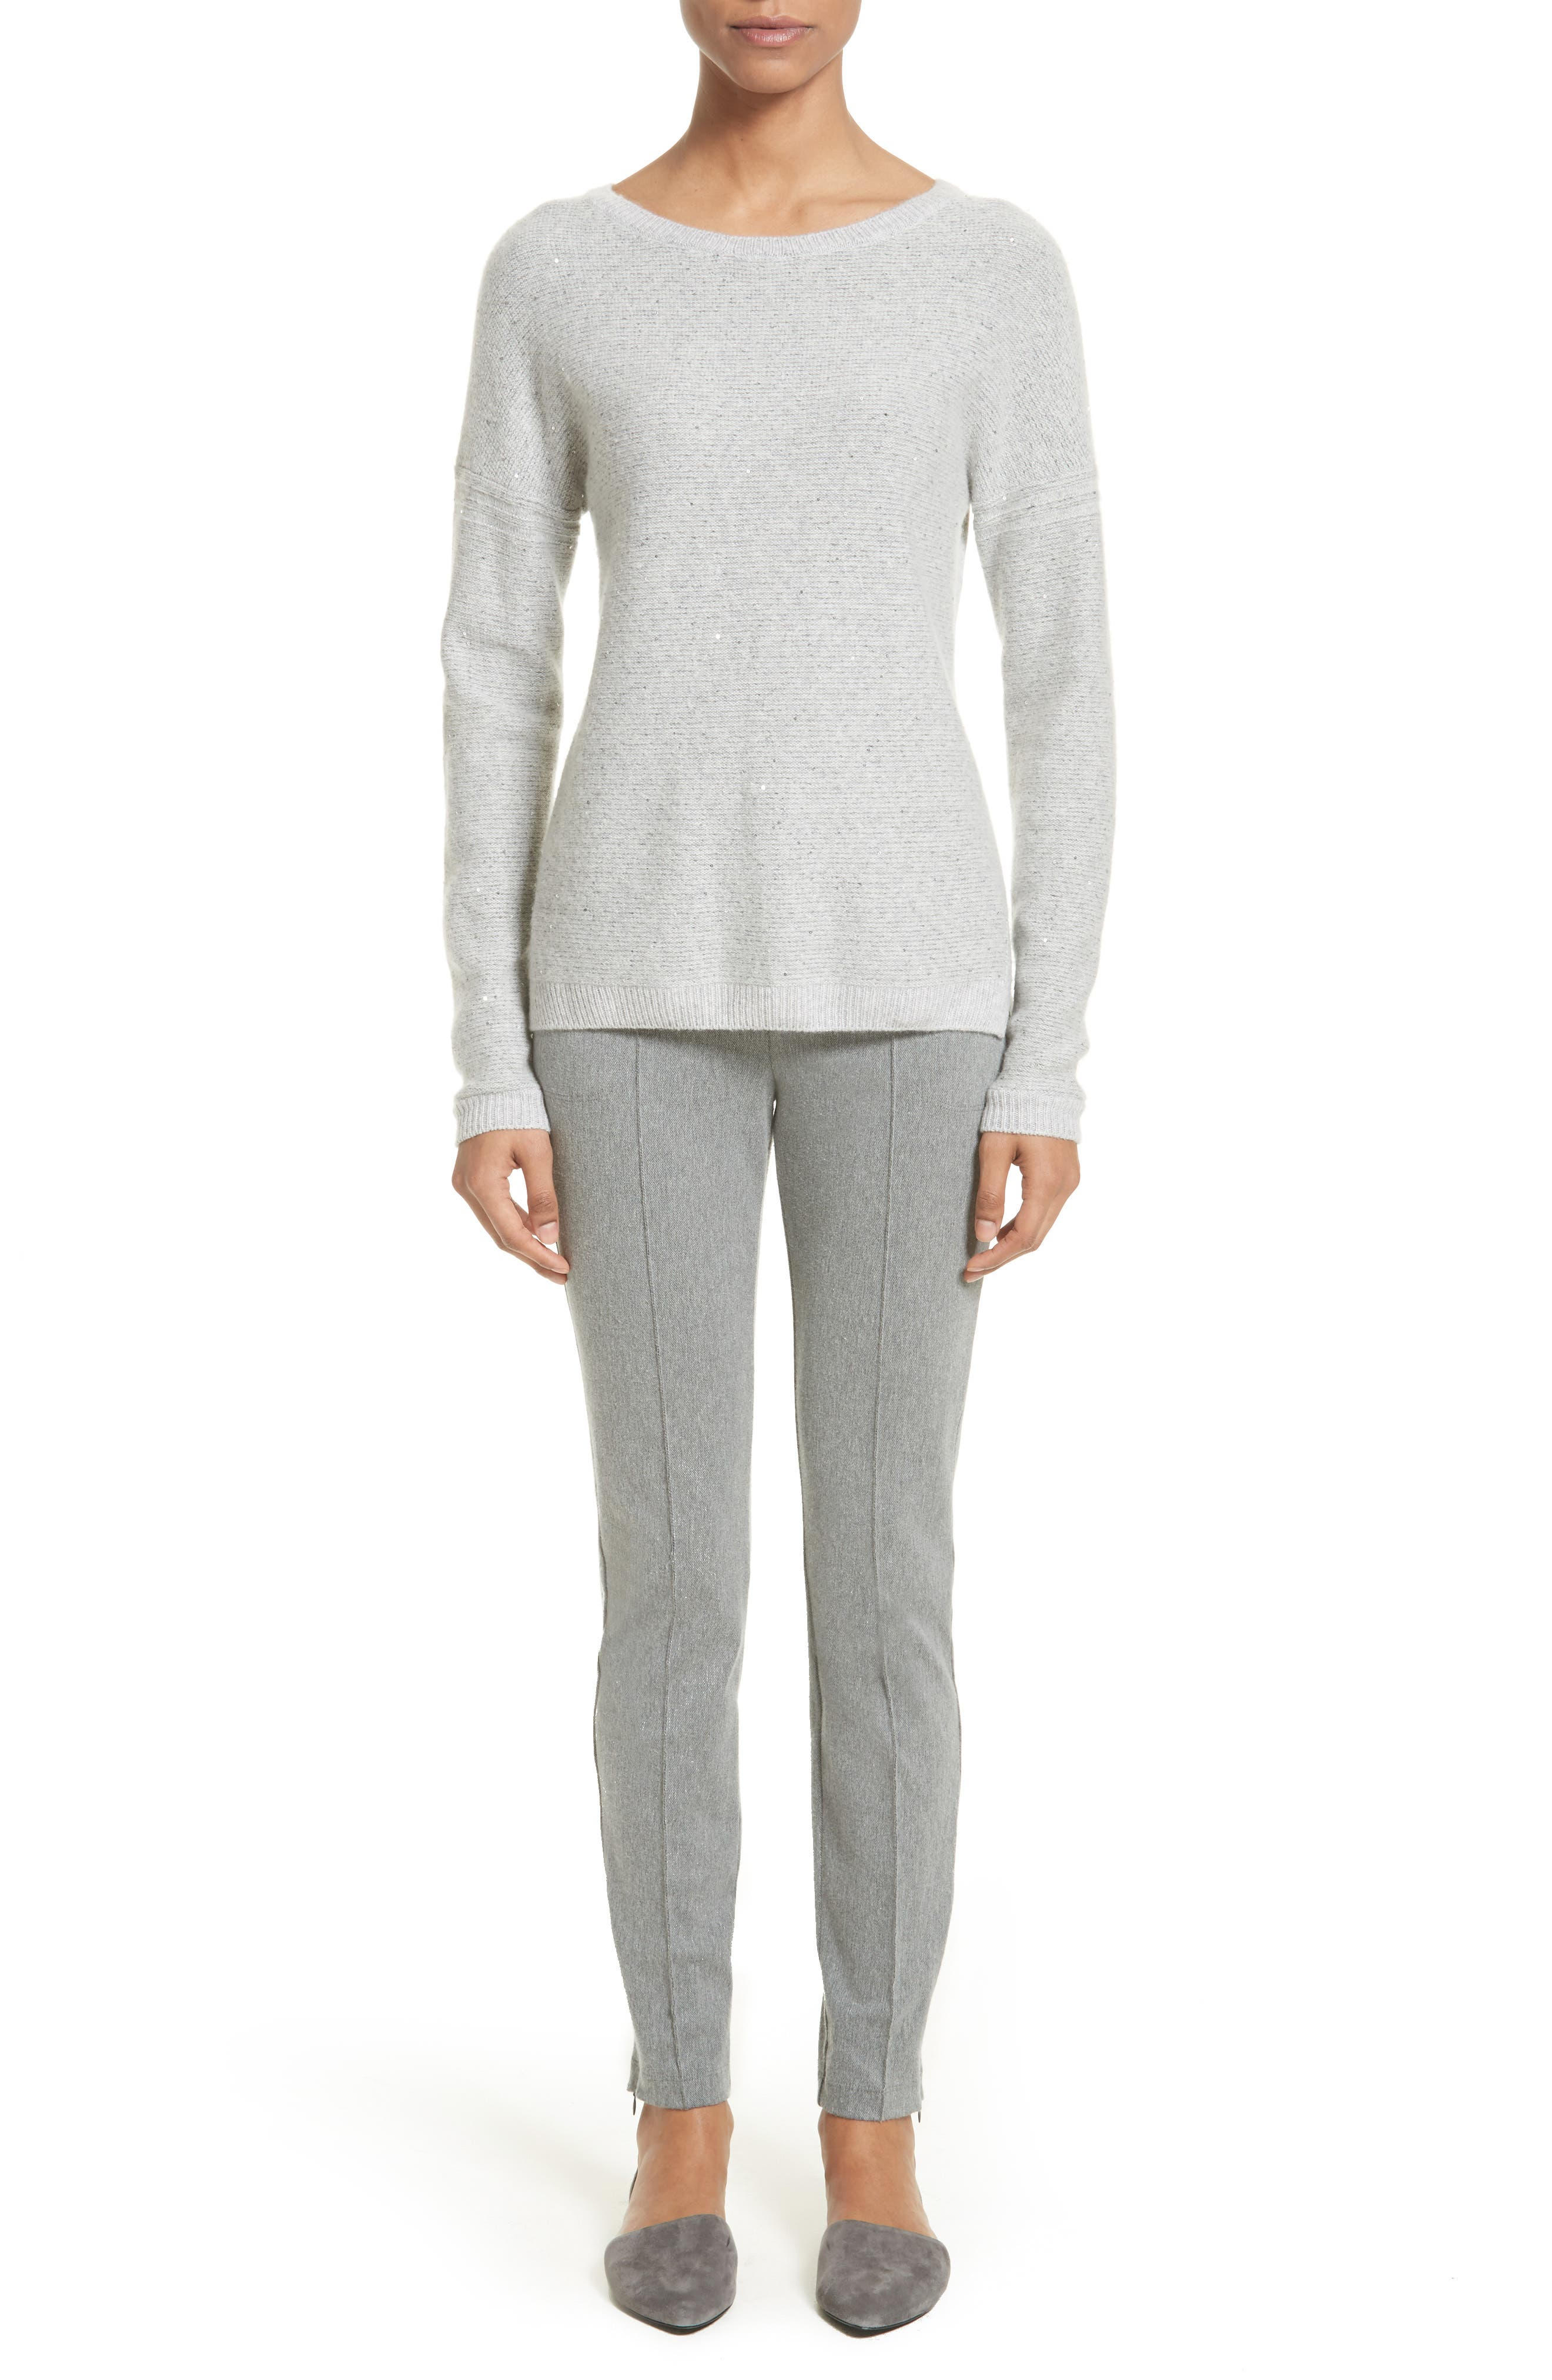 Micro Sequin Stripe Reverse Jersey Cashmere Blend Sweater,                             Alternate thumbnail 7, color,                             Light Grey Melange